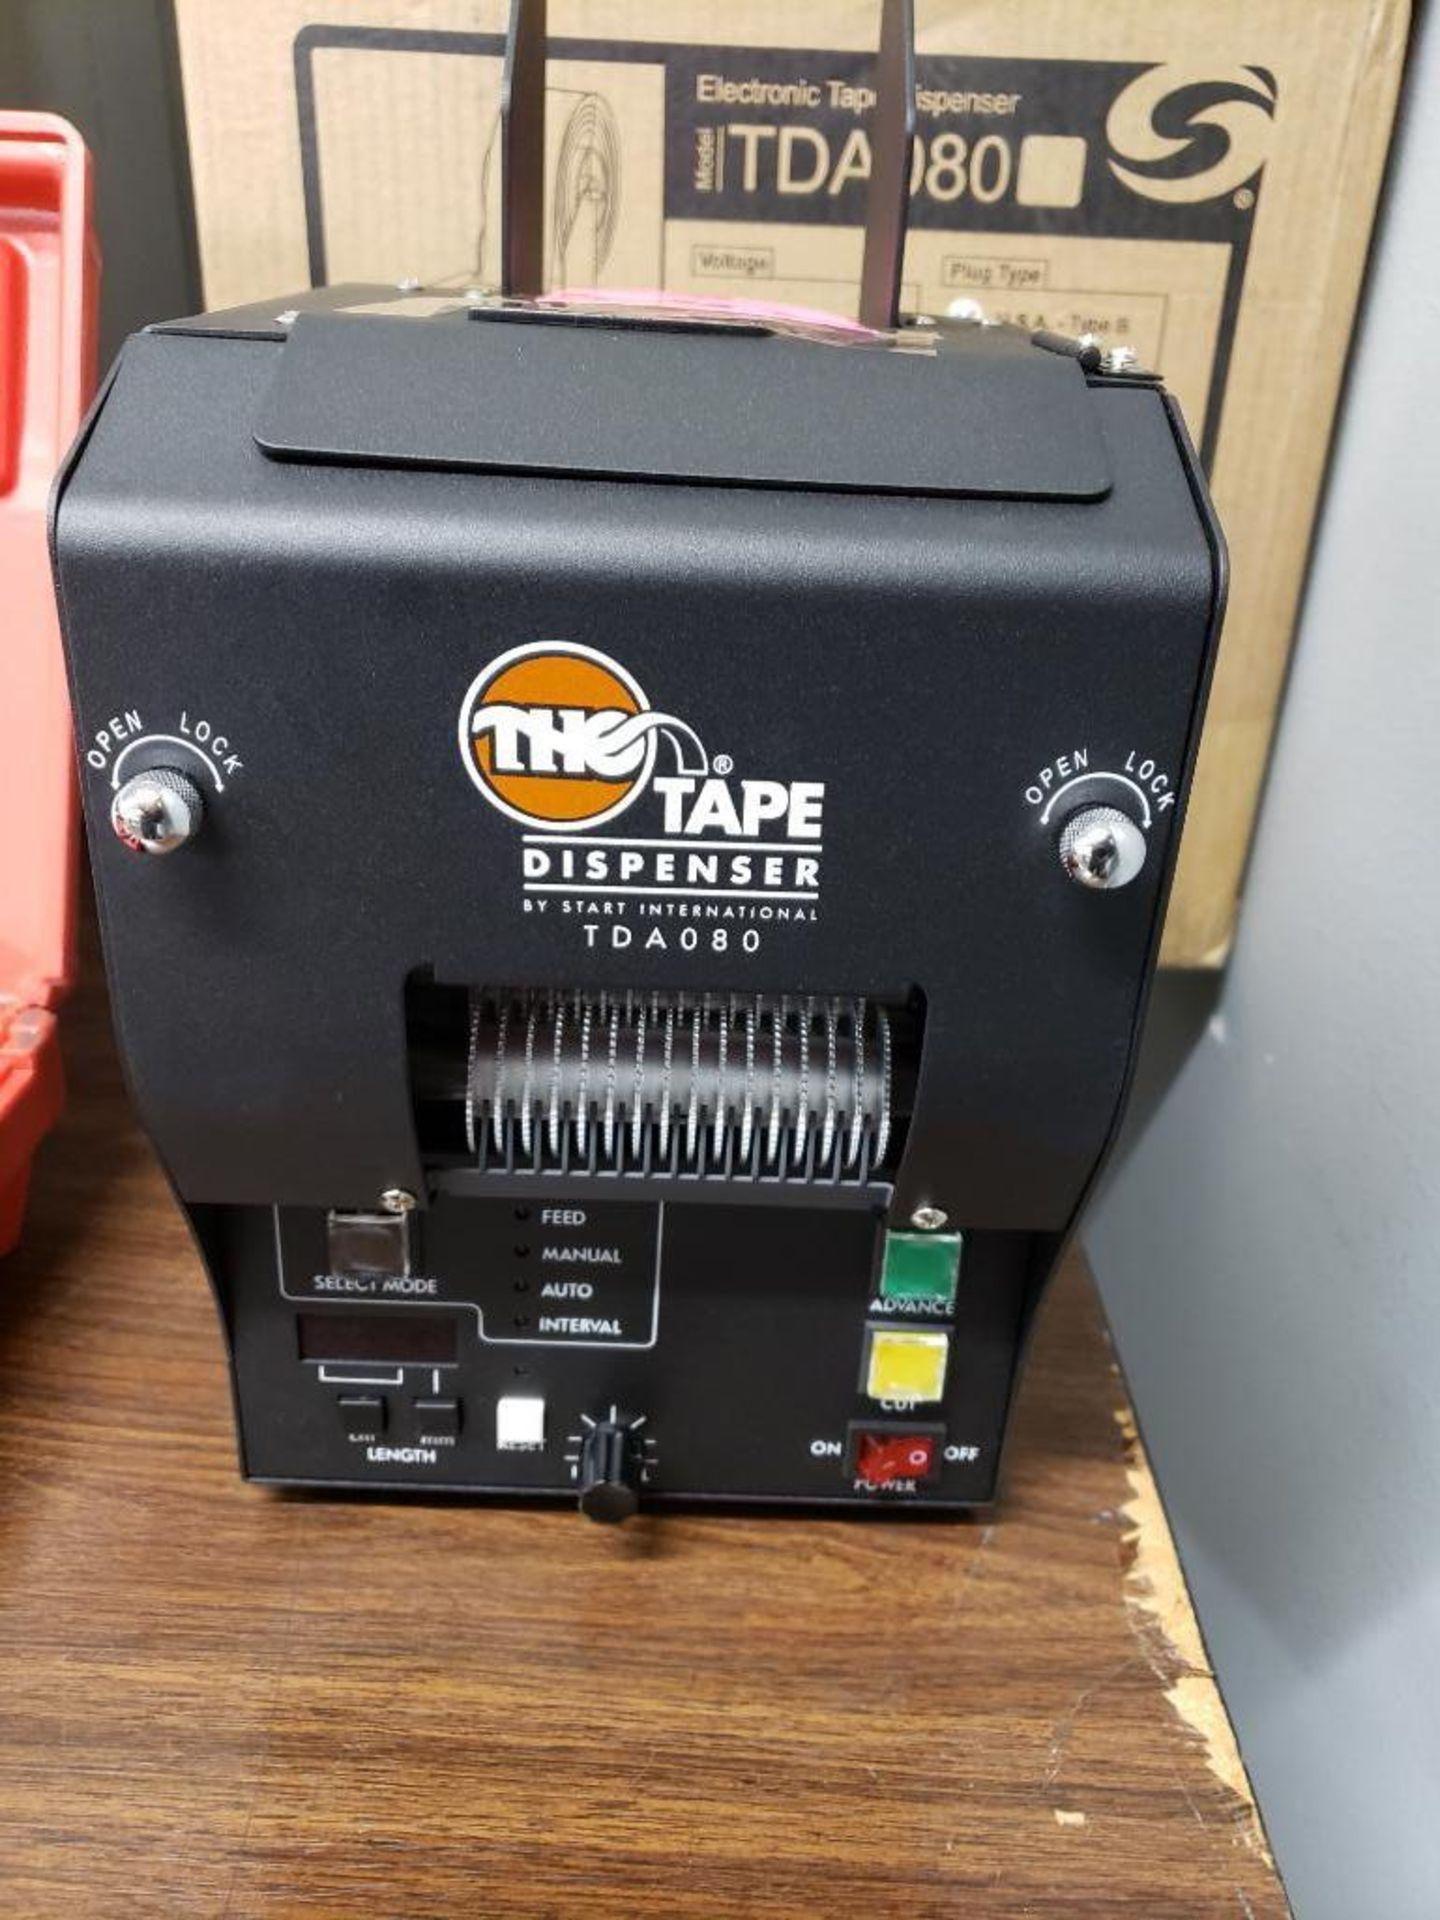 Lot 510 - The Tape Dispenser. Modle TDA080. New in box.